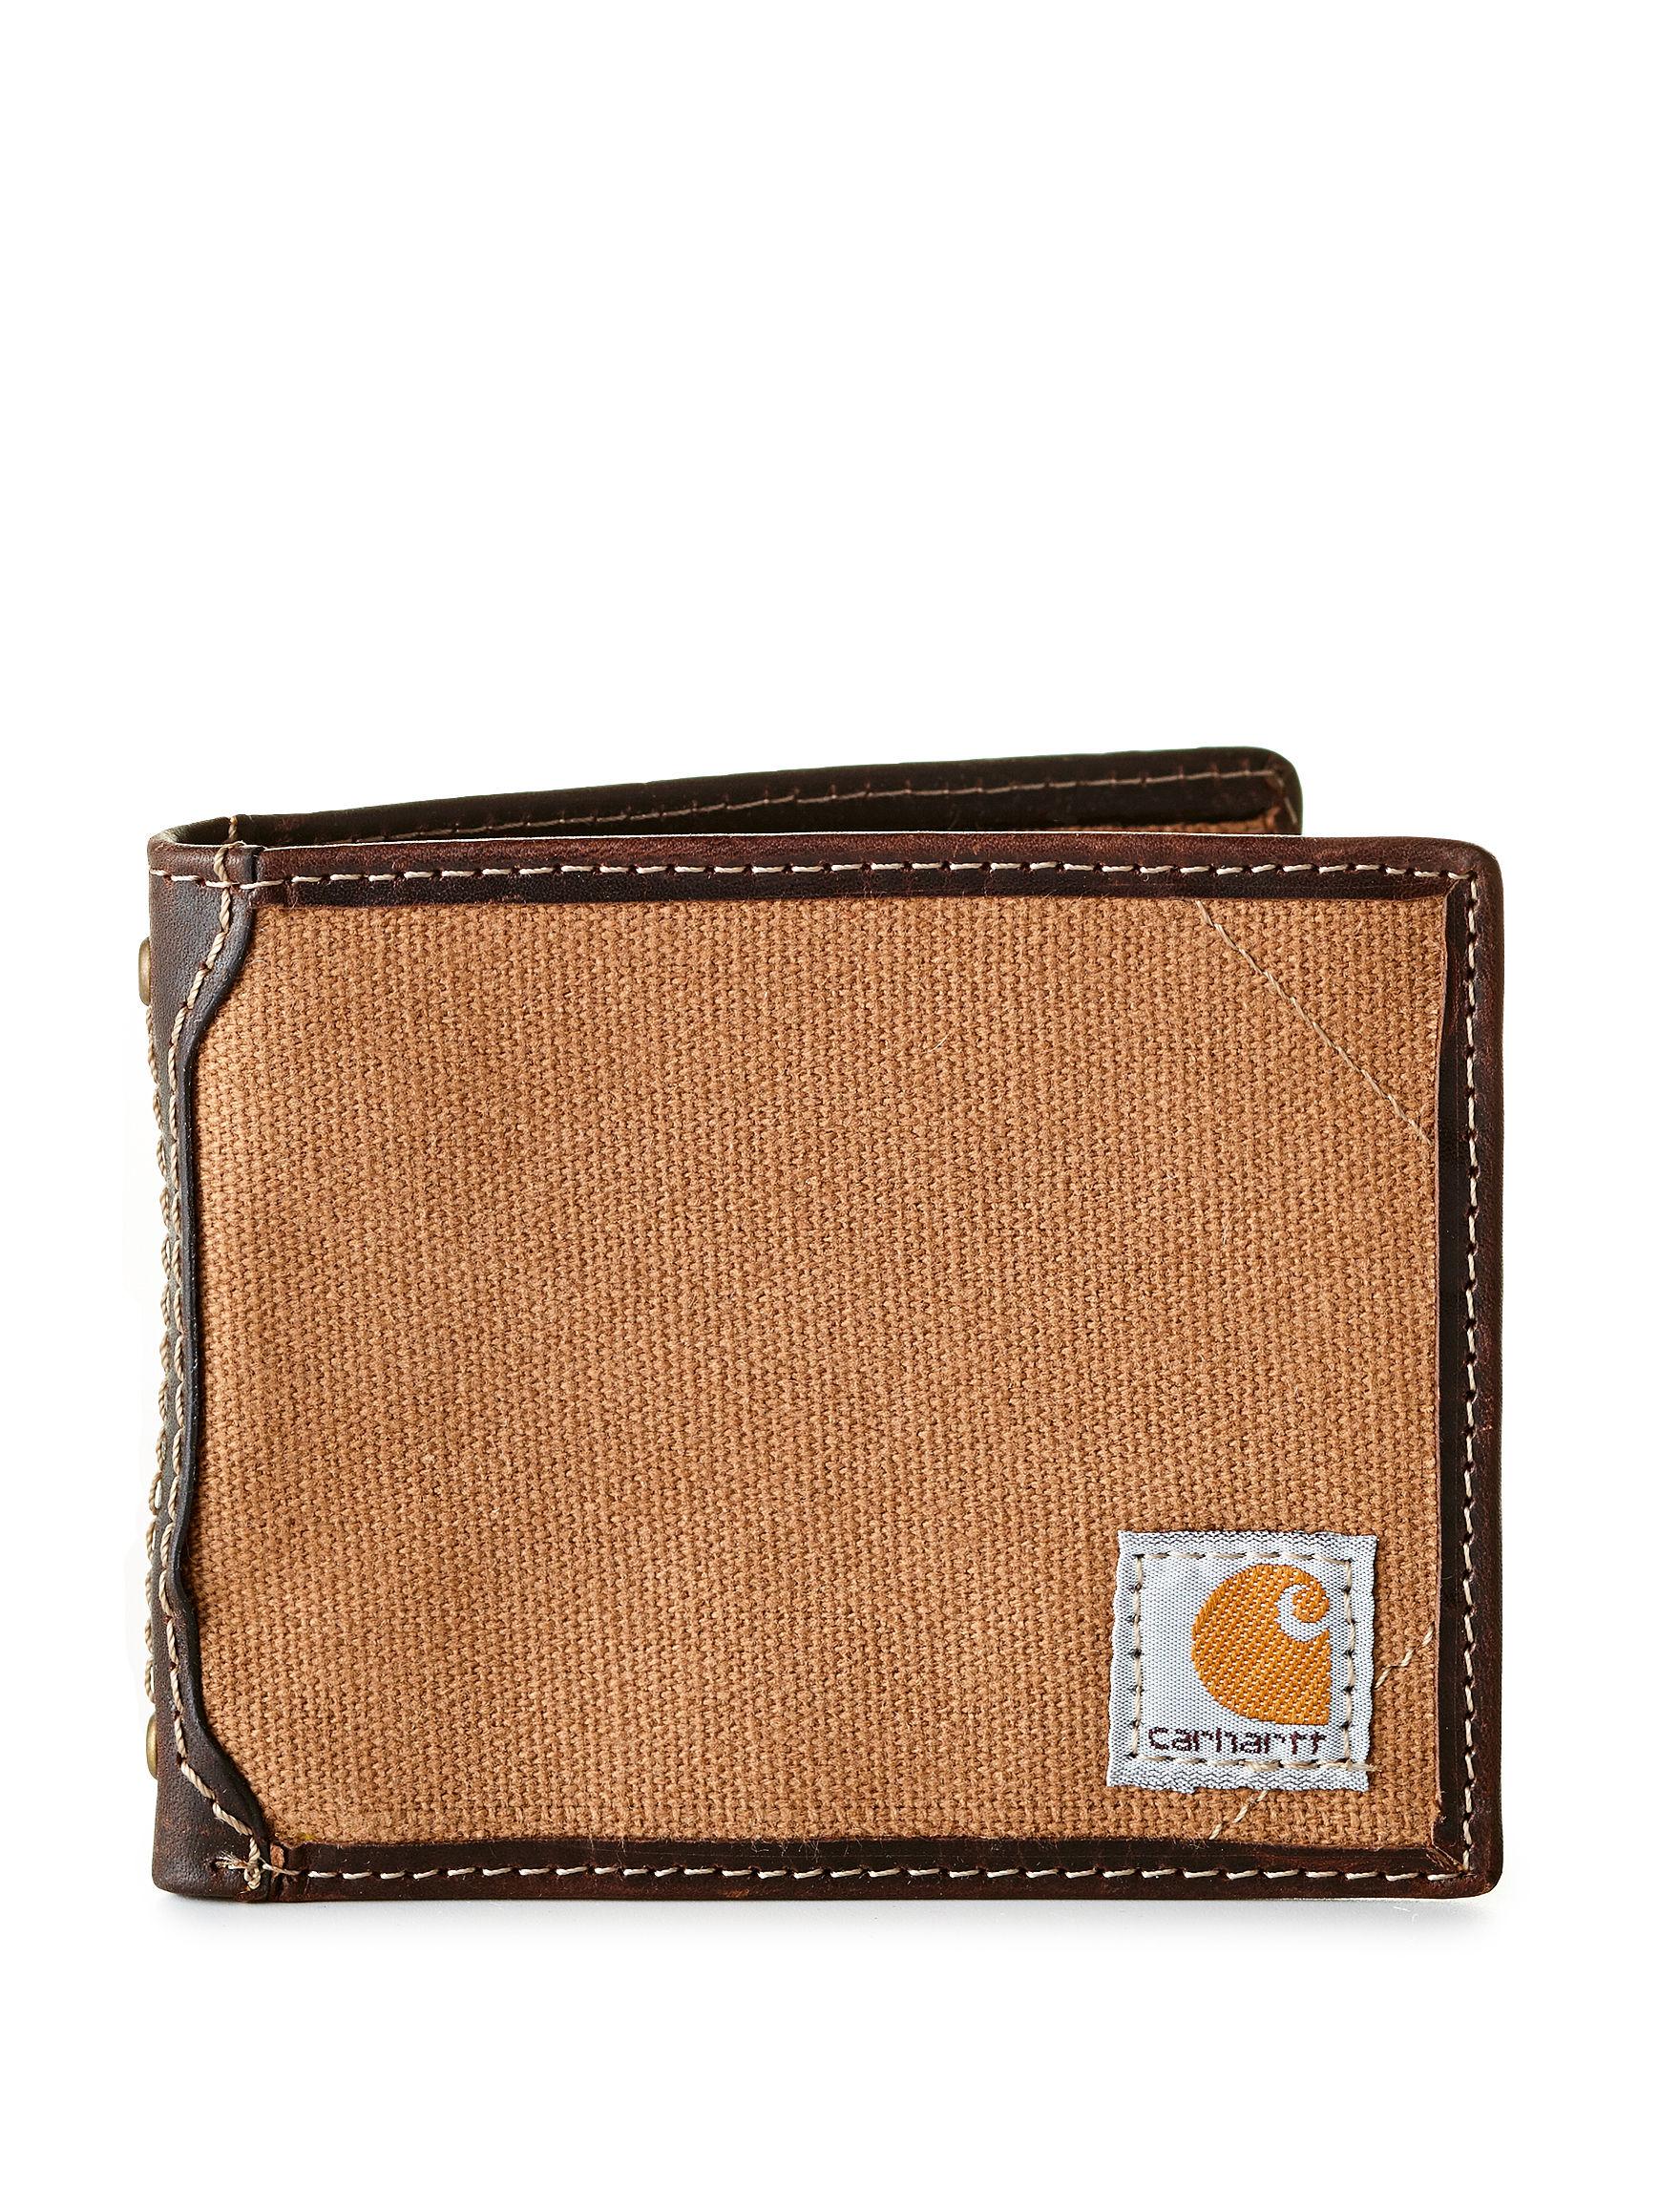 Carhartt Brown Bi-fold Wallets